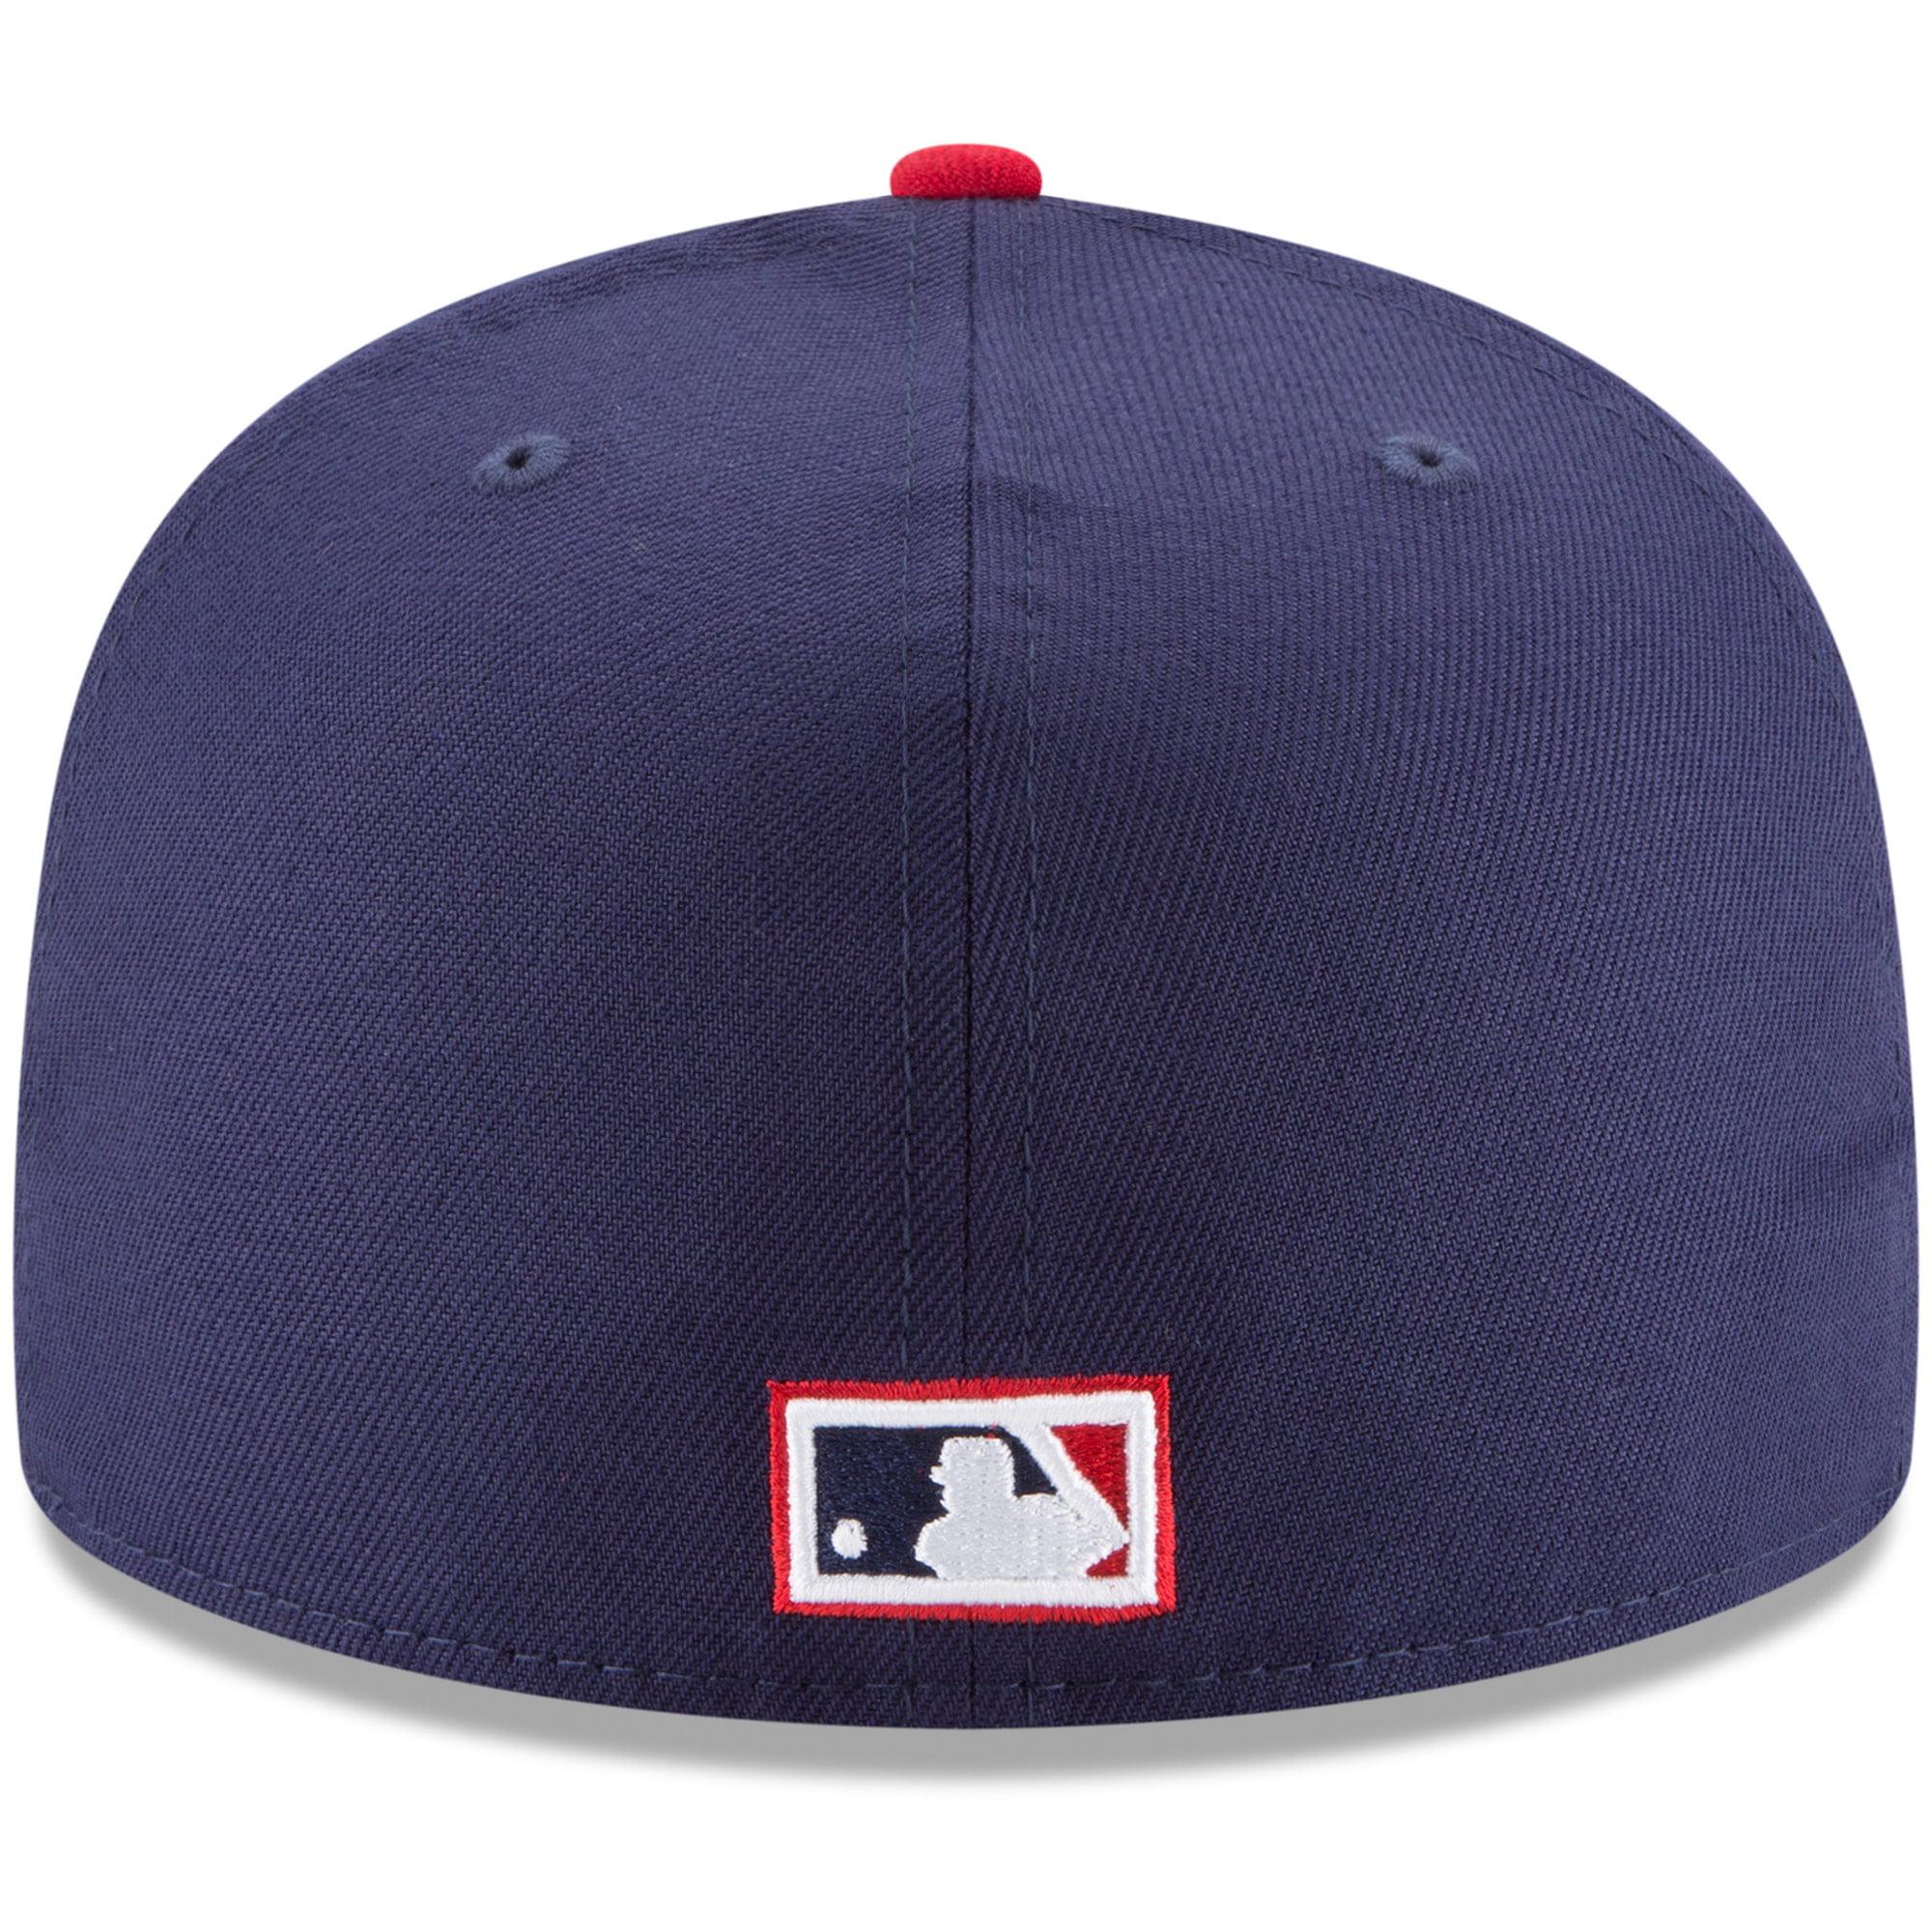 Atlanta Braves New Era Patriotic Turn 59FIFTY Fitted Hat - Navy -  Walmart.com 55b7d503cf9